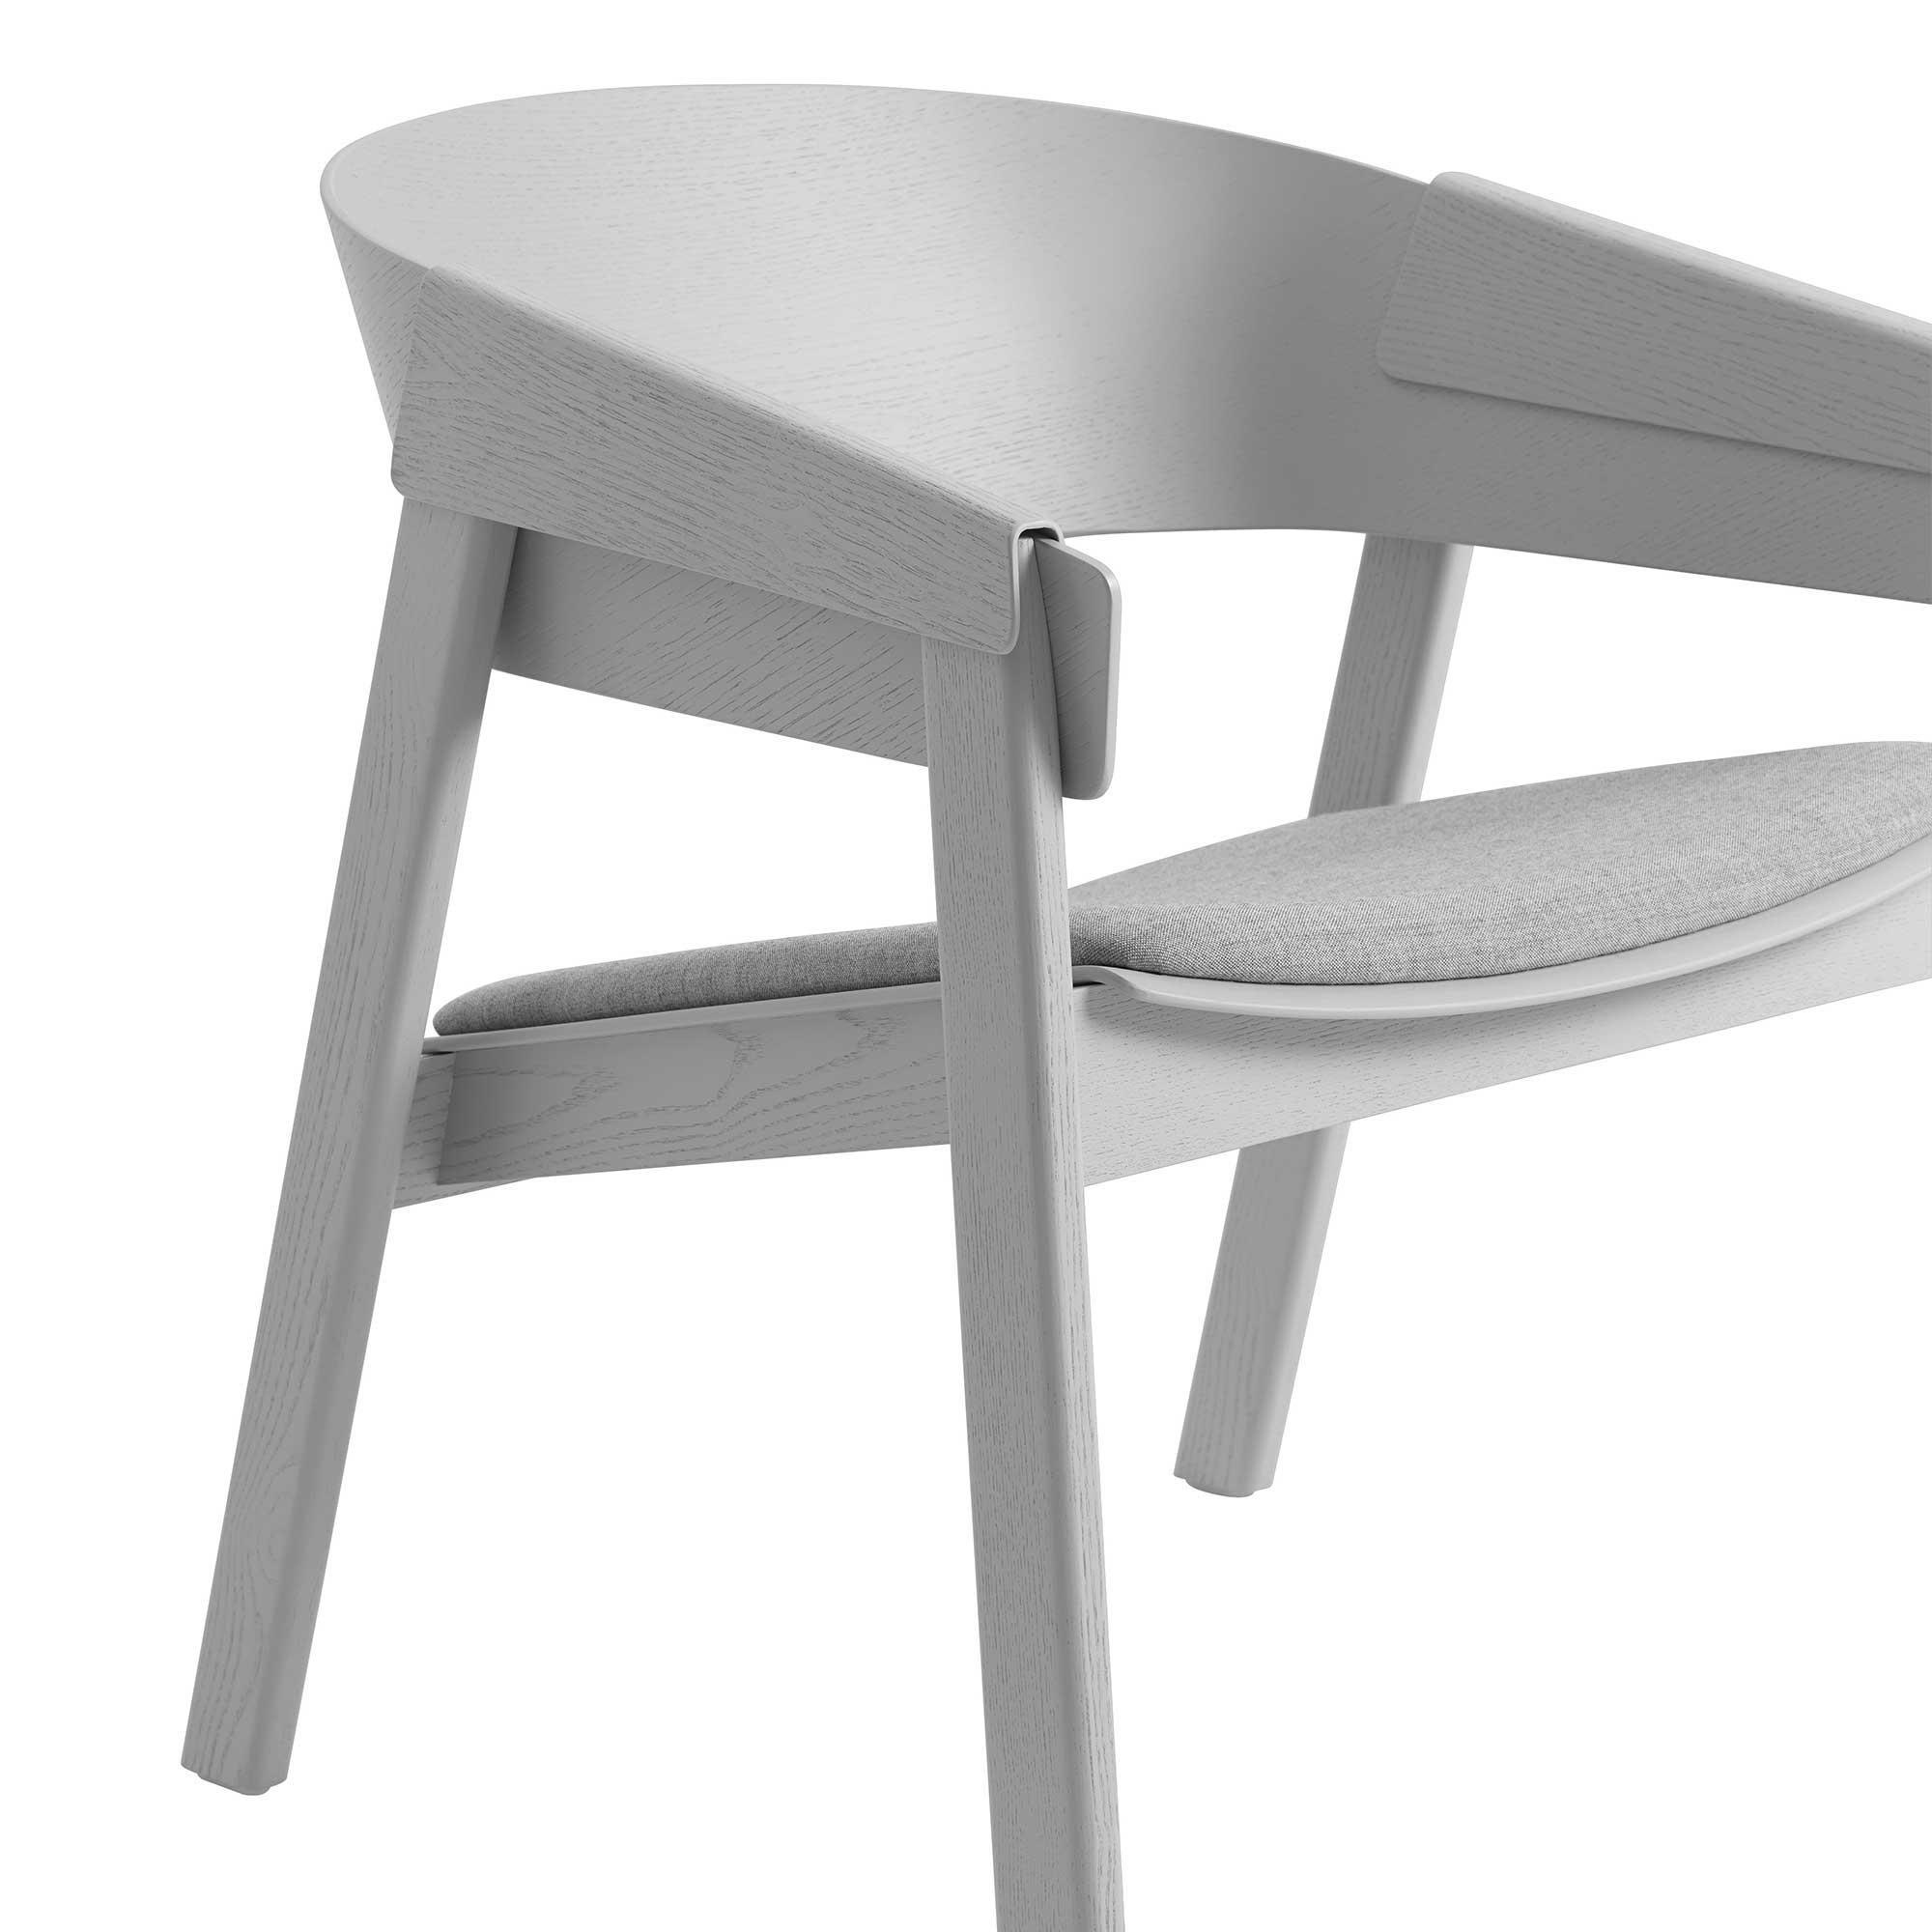 Muuto cover lounge stuhl gepolstert ambientedirect for Stuhl gepolstert